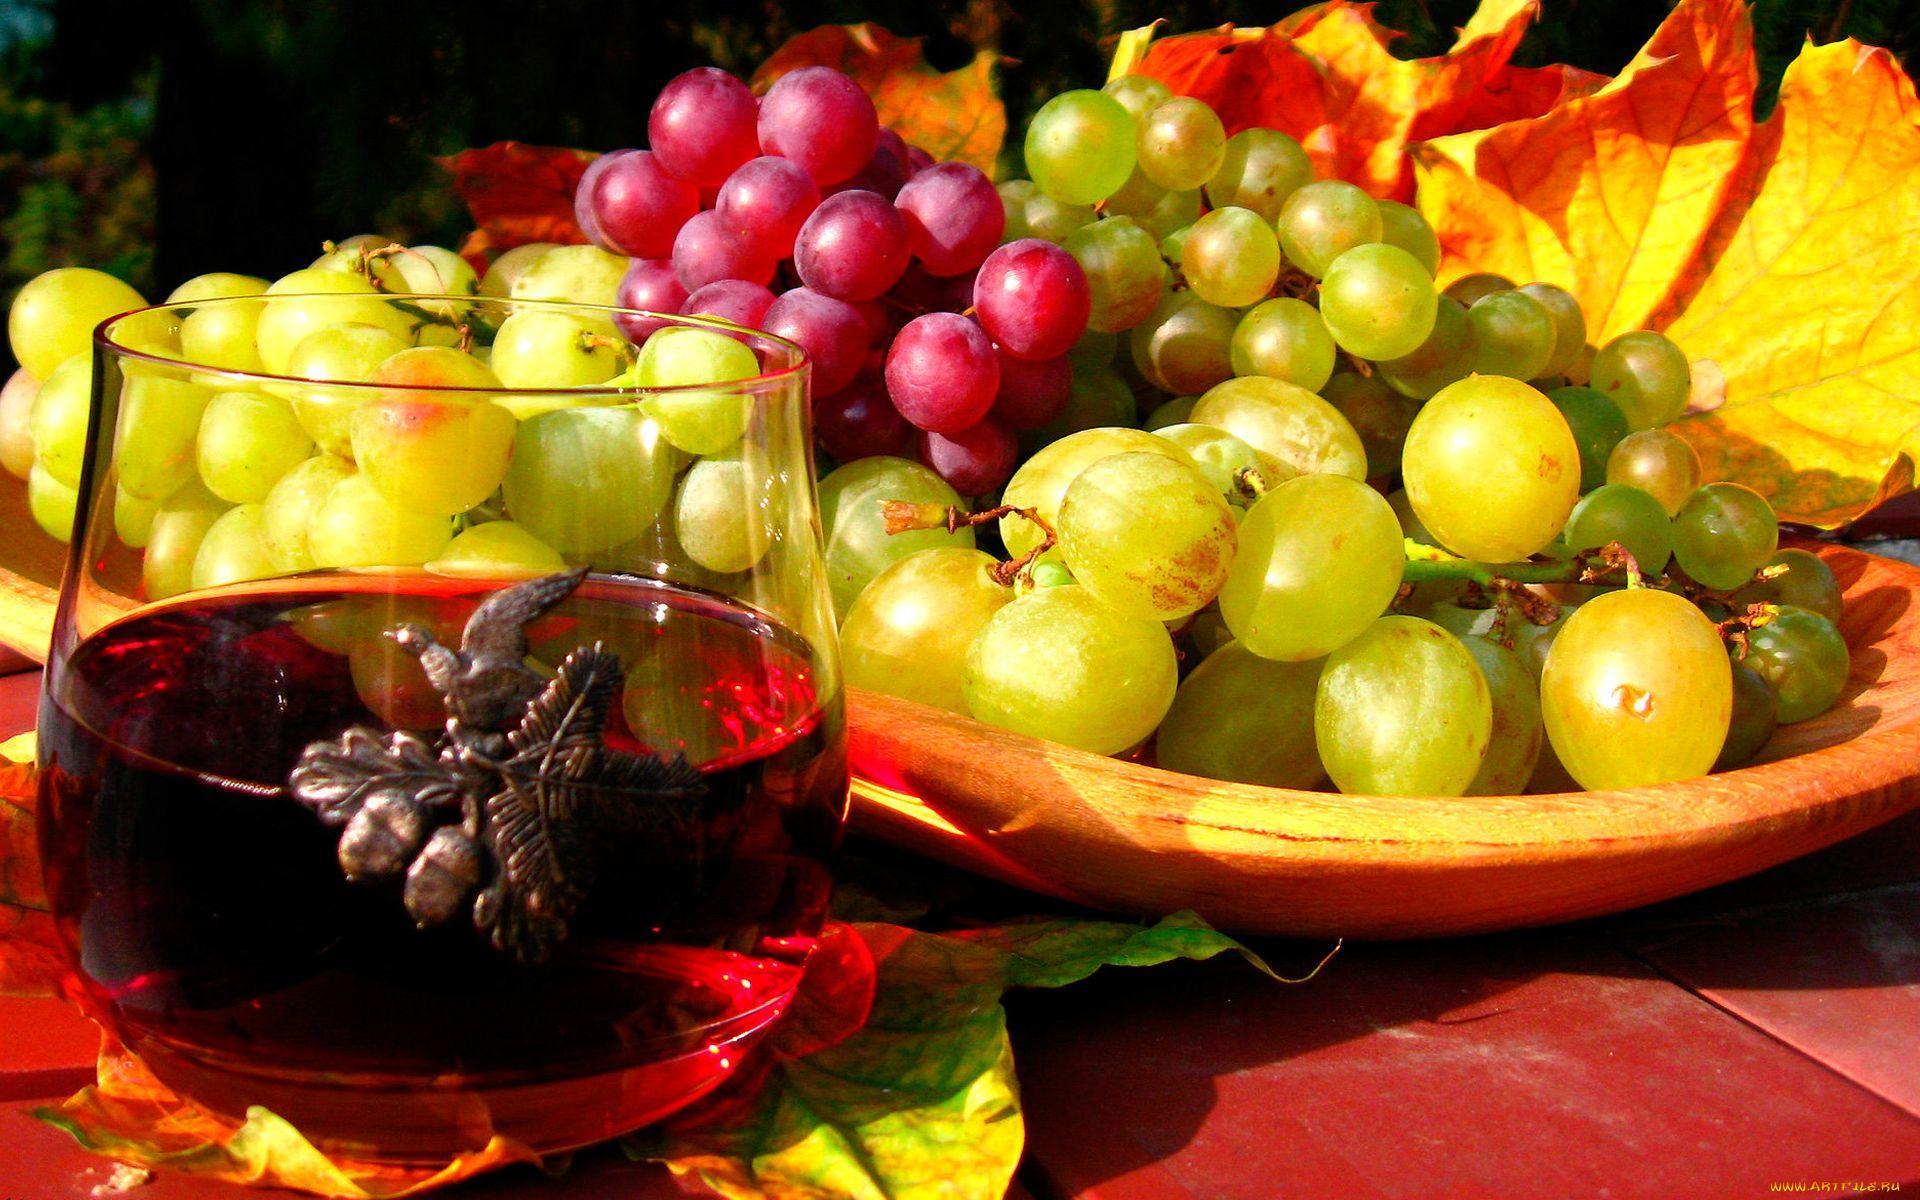 виноград на столе в вазе фото выбрать тахту ортопедическим